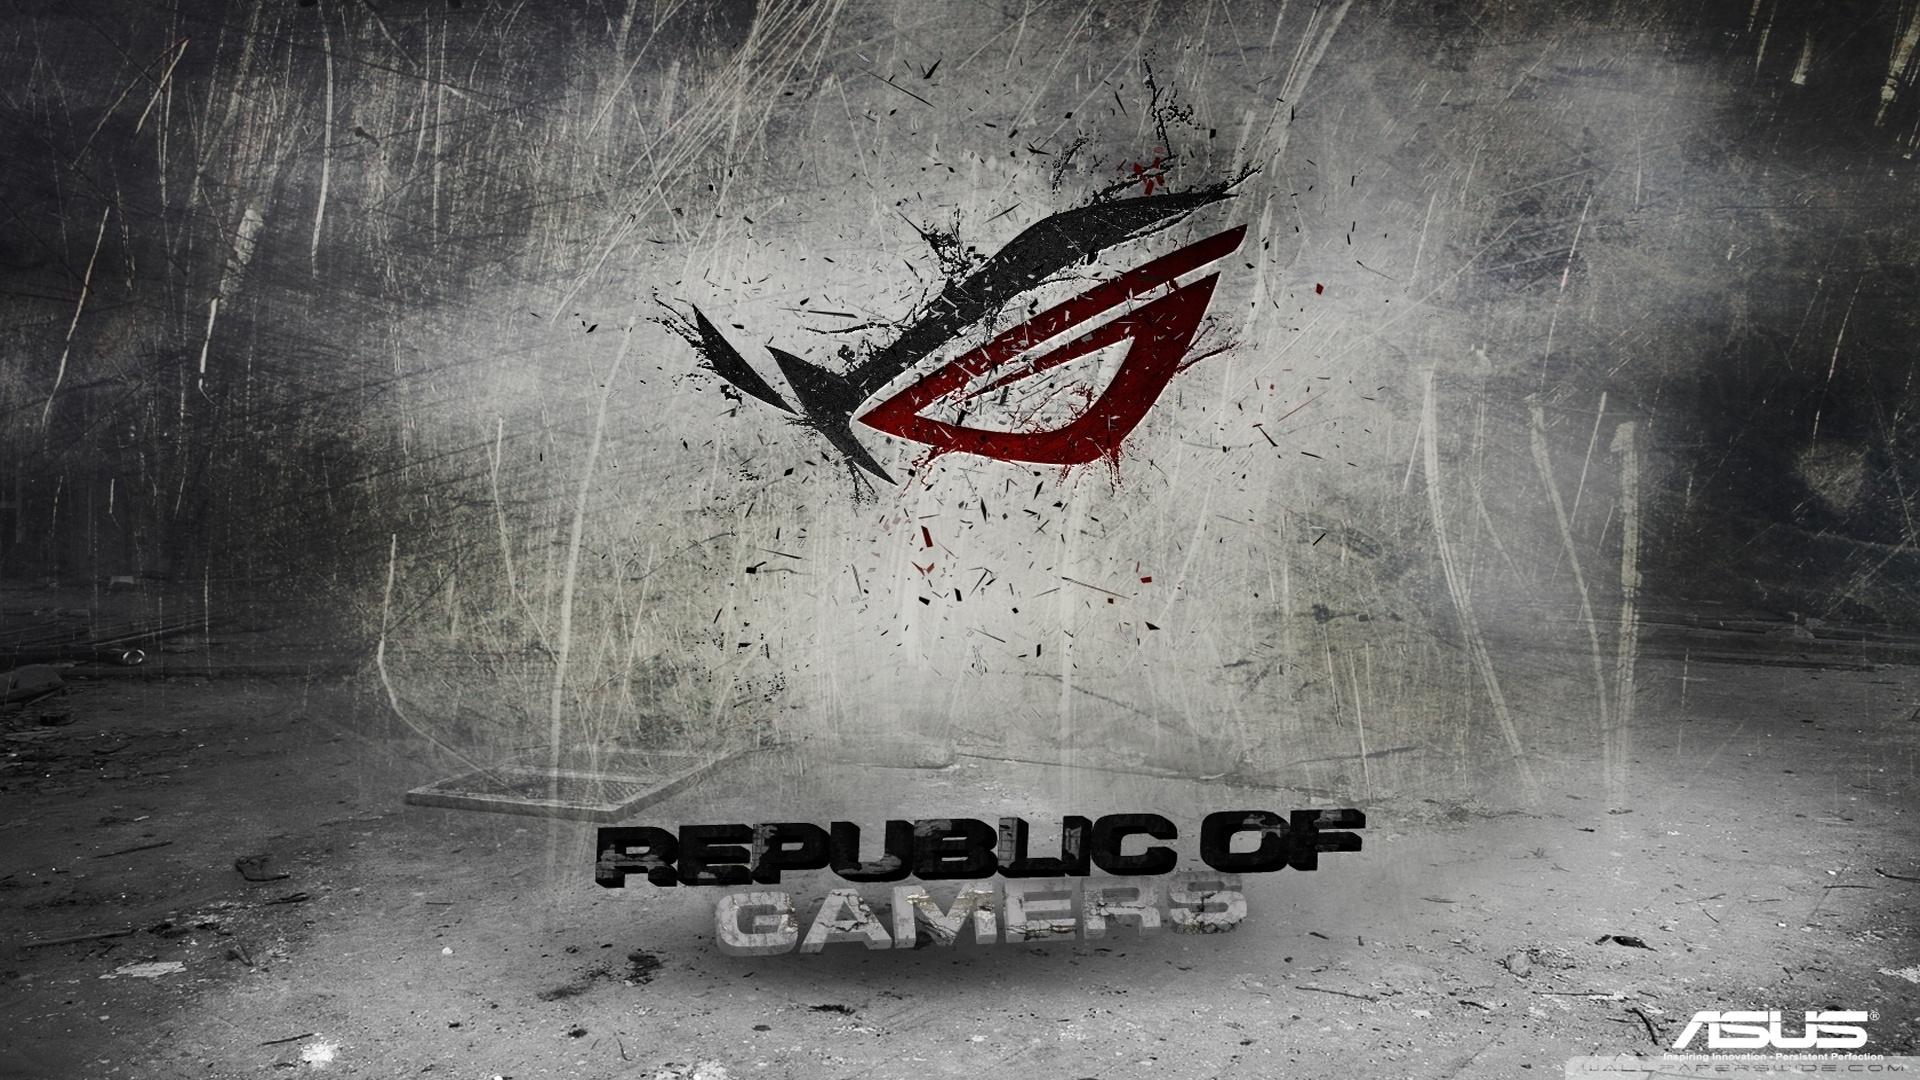 asus republic of gamers background ❤ 4k hd desktop wallpaper for 4k